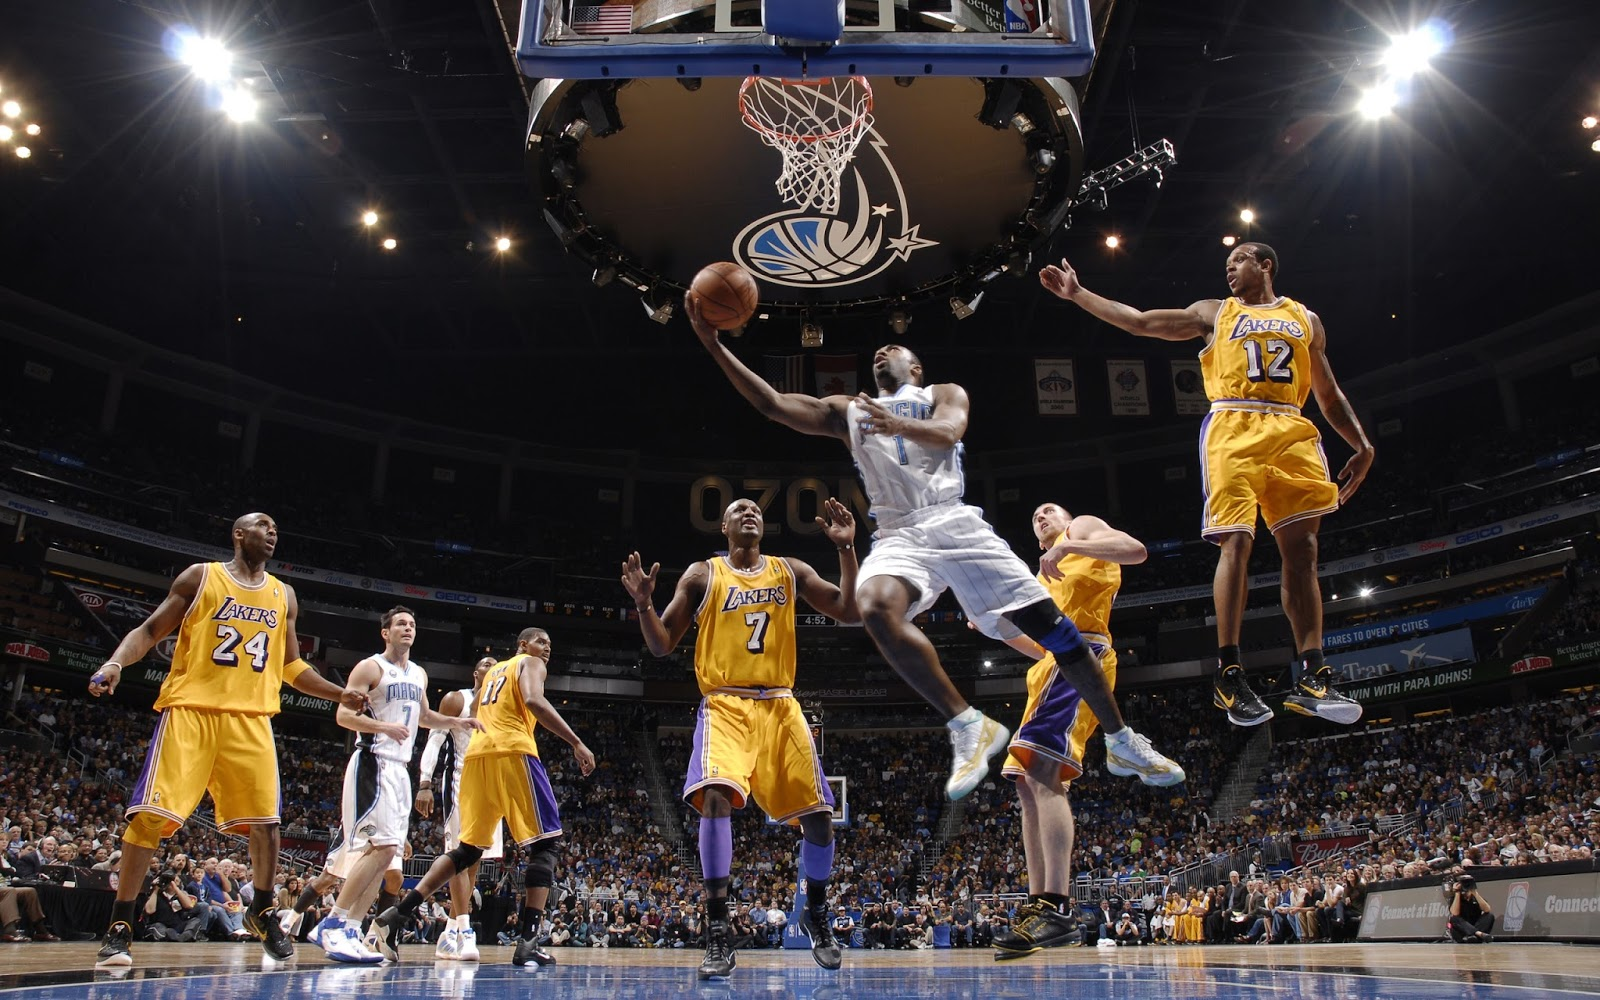 Fondo de Pantalla Baloncesto Lakers vs Magic